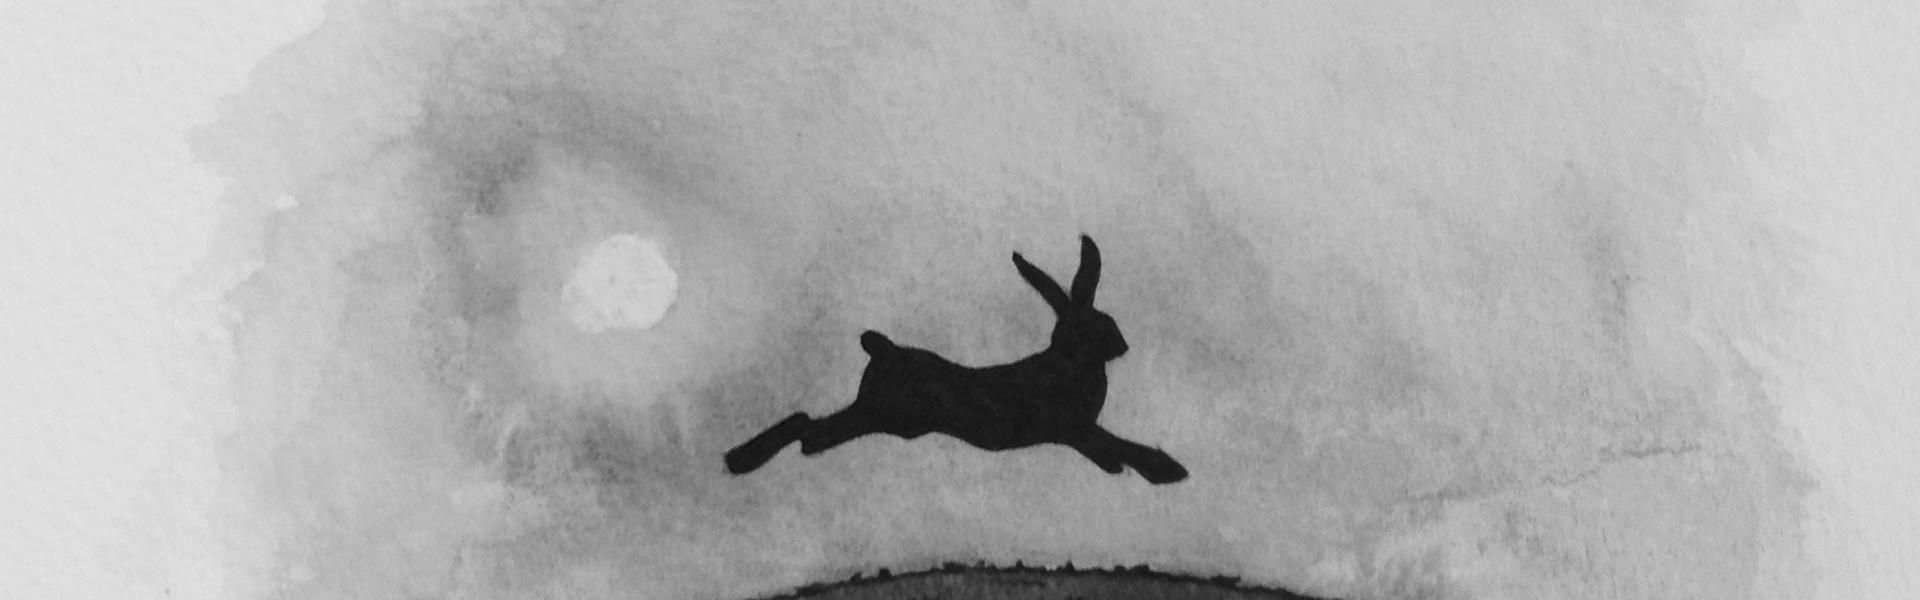 British wildlife hare running over hill detail